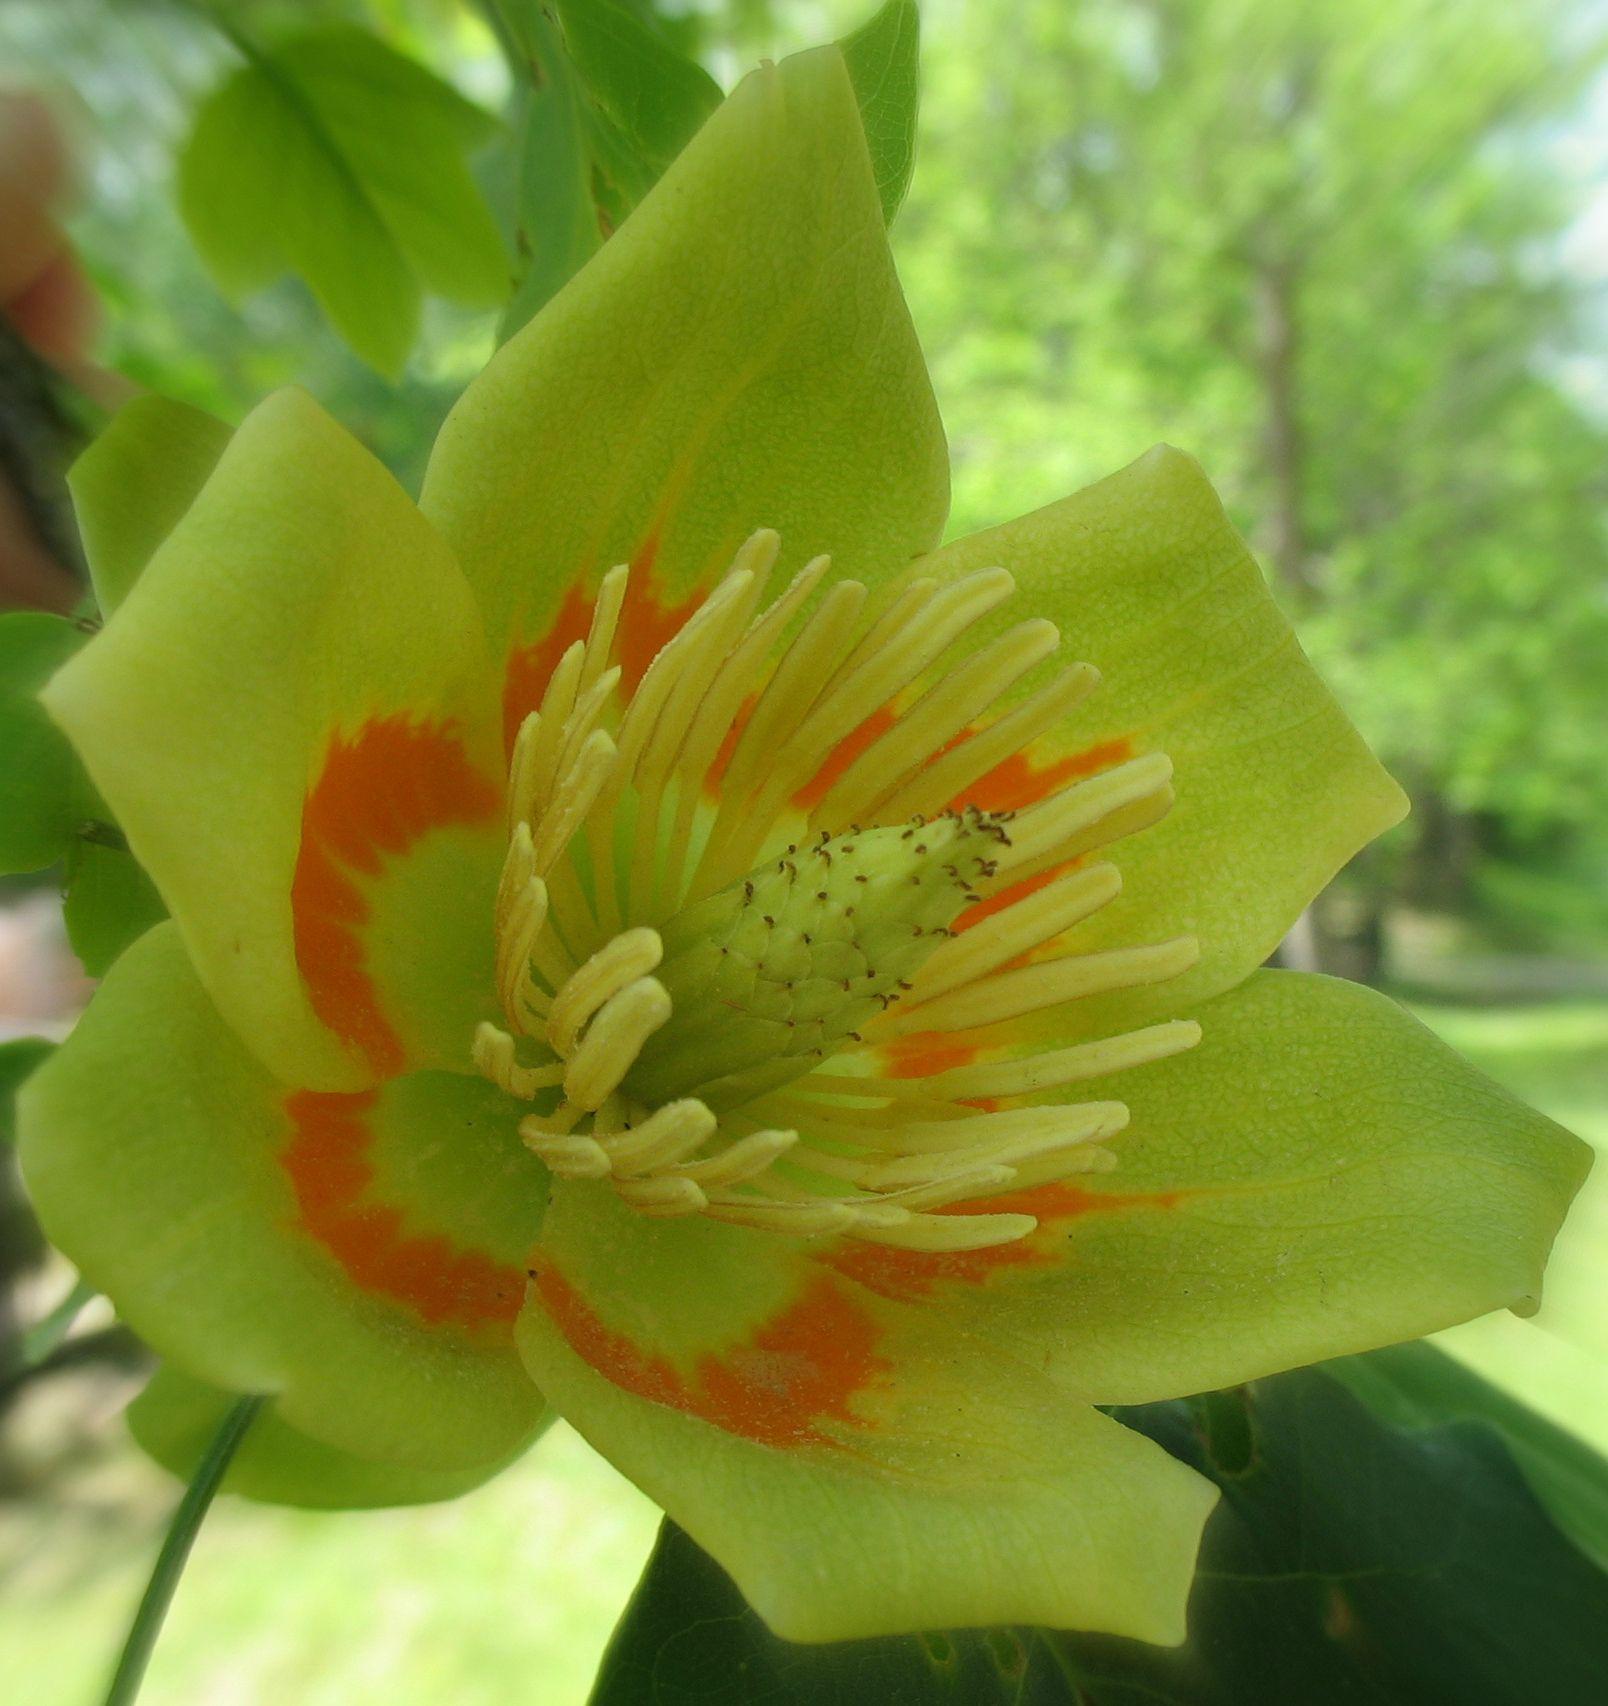 tuliptree fast growing shade tree Plants, Fast growing